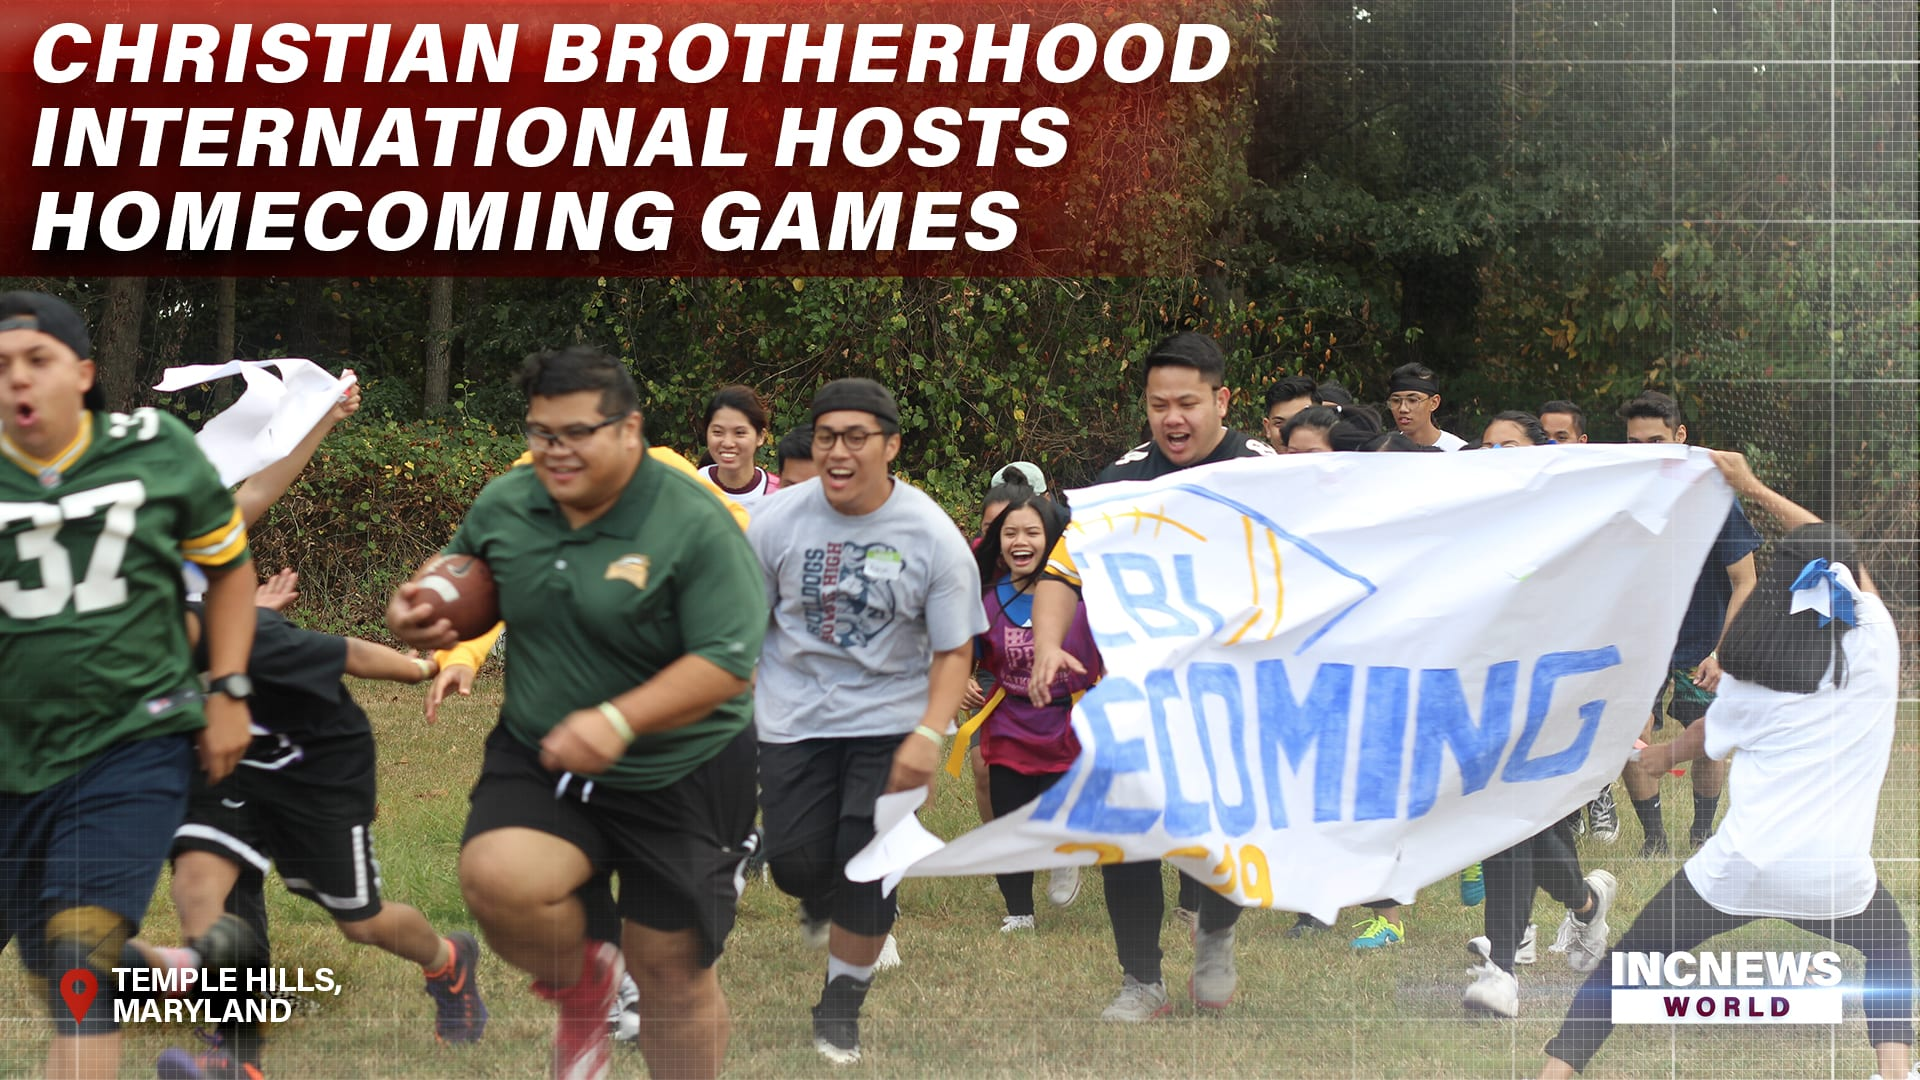 Christian Brotherhood International Hosts Homecoming Games